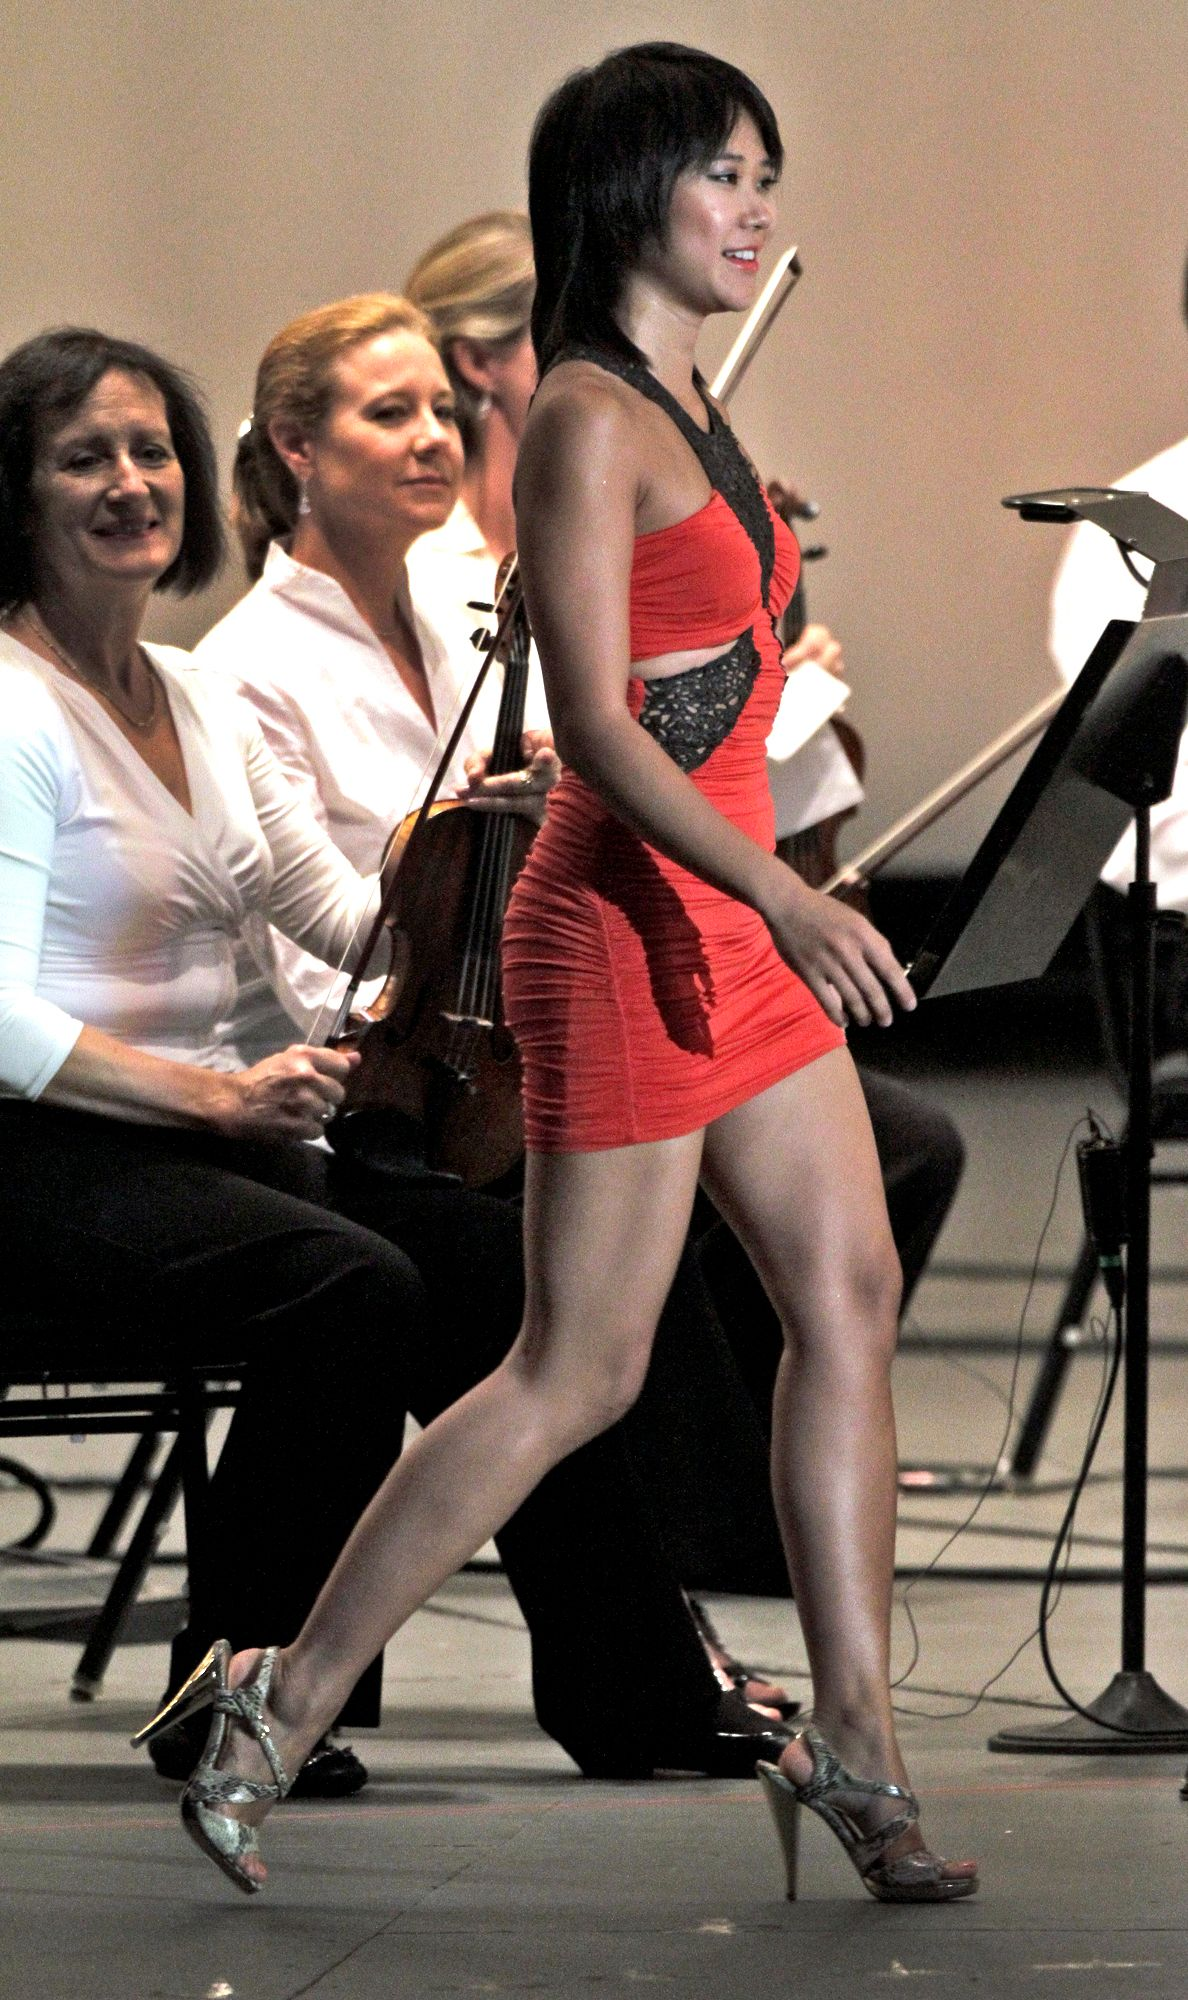 王羽佳的短裙,也是眾人焦點。Photo: Lawrence K. Ho / Los Angeles Times